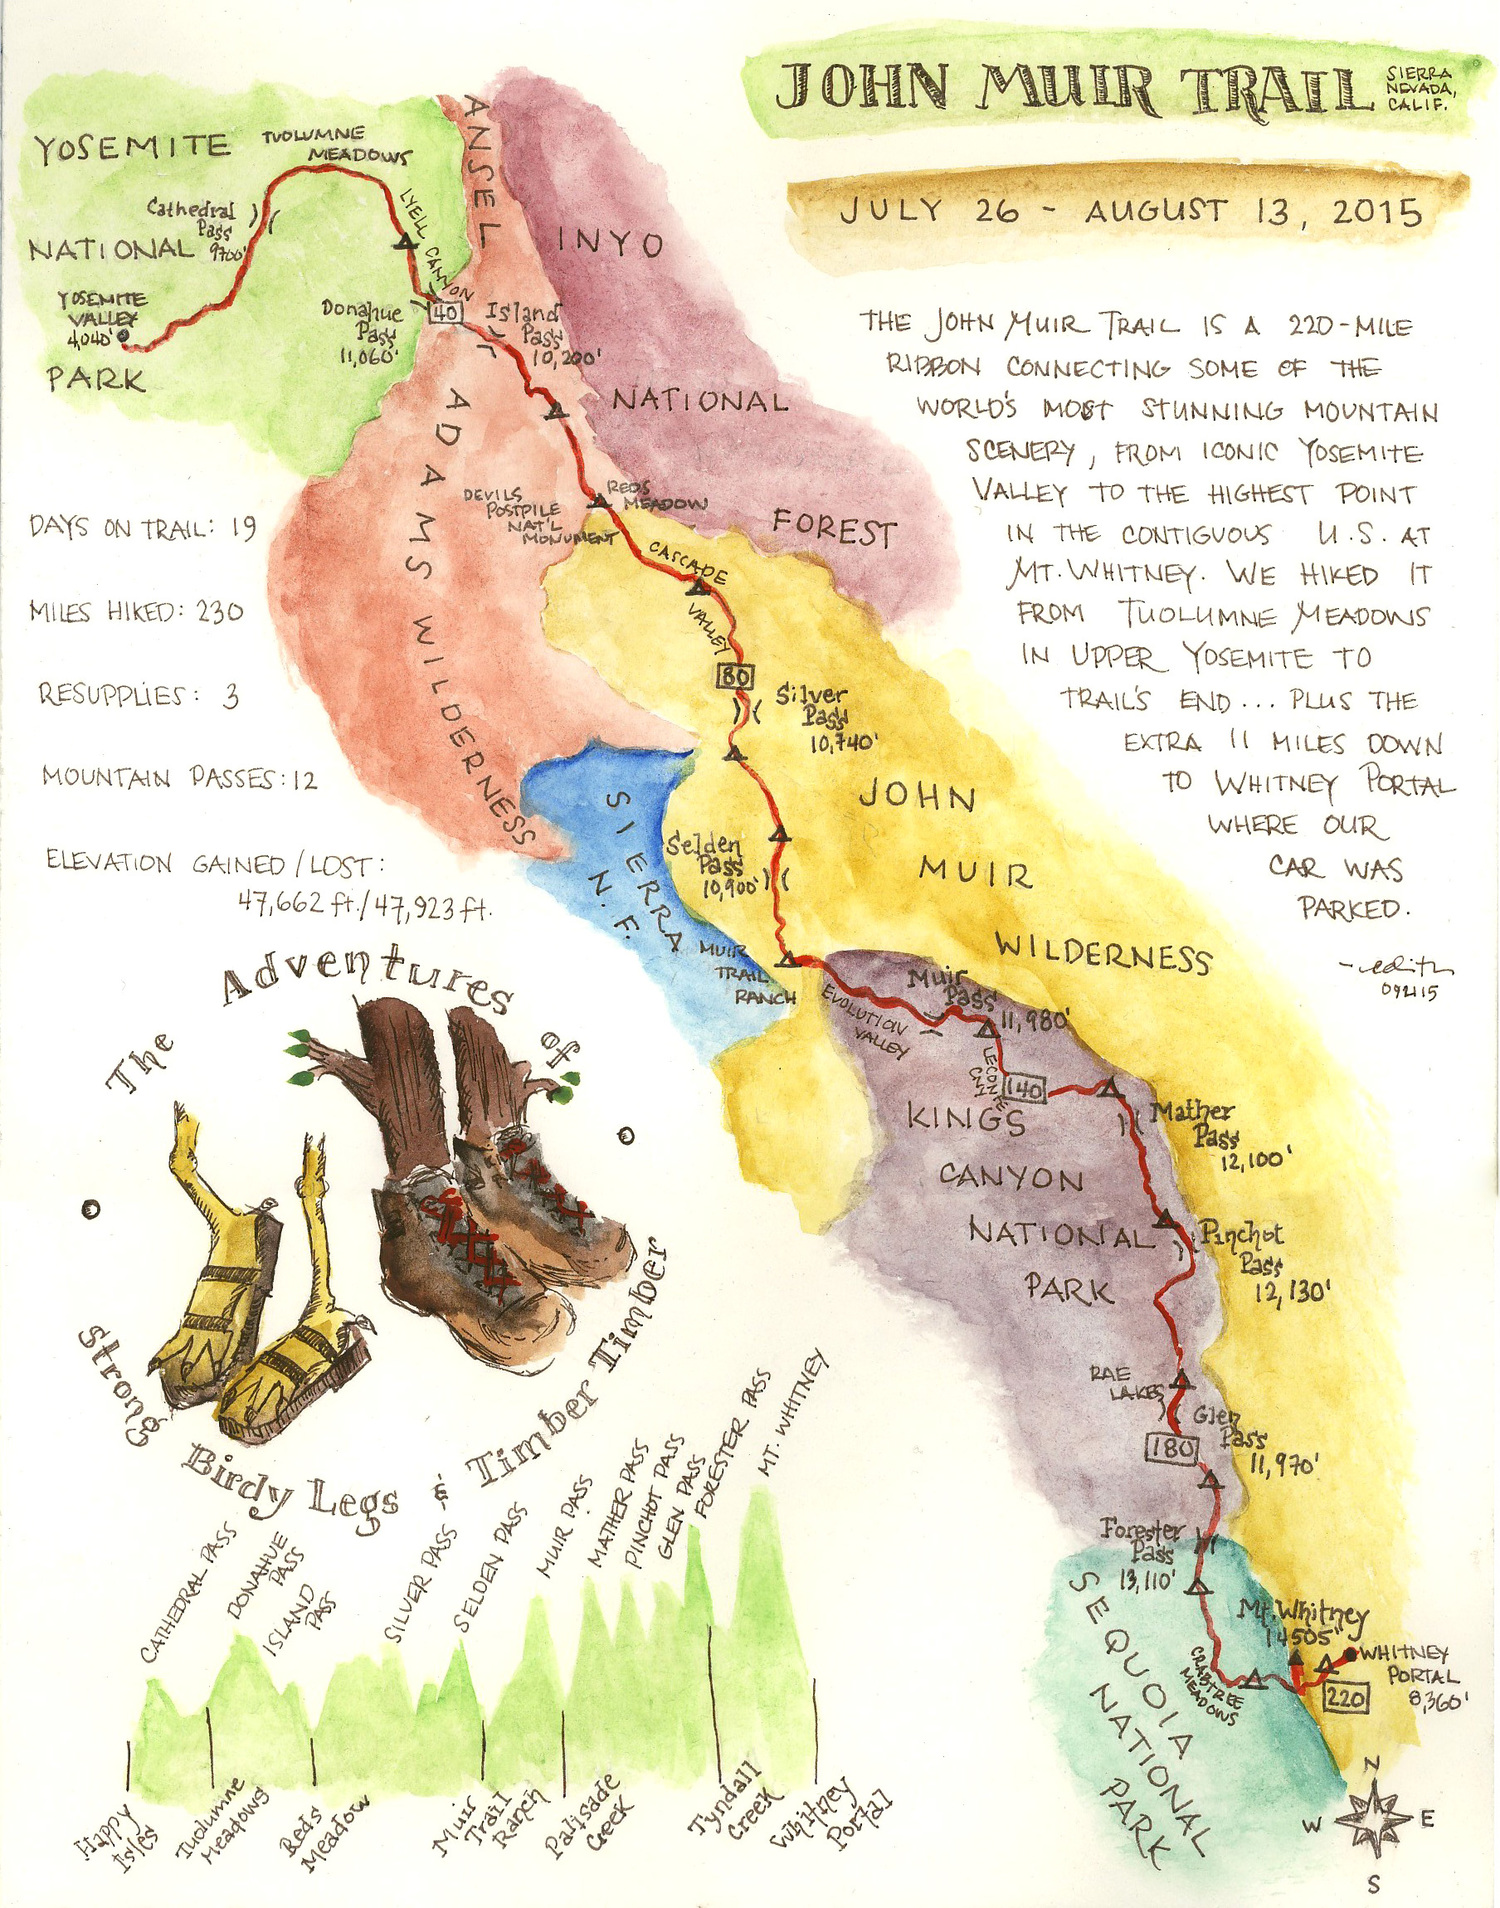 John Muir Trail  besthikecom